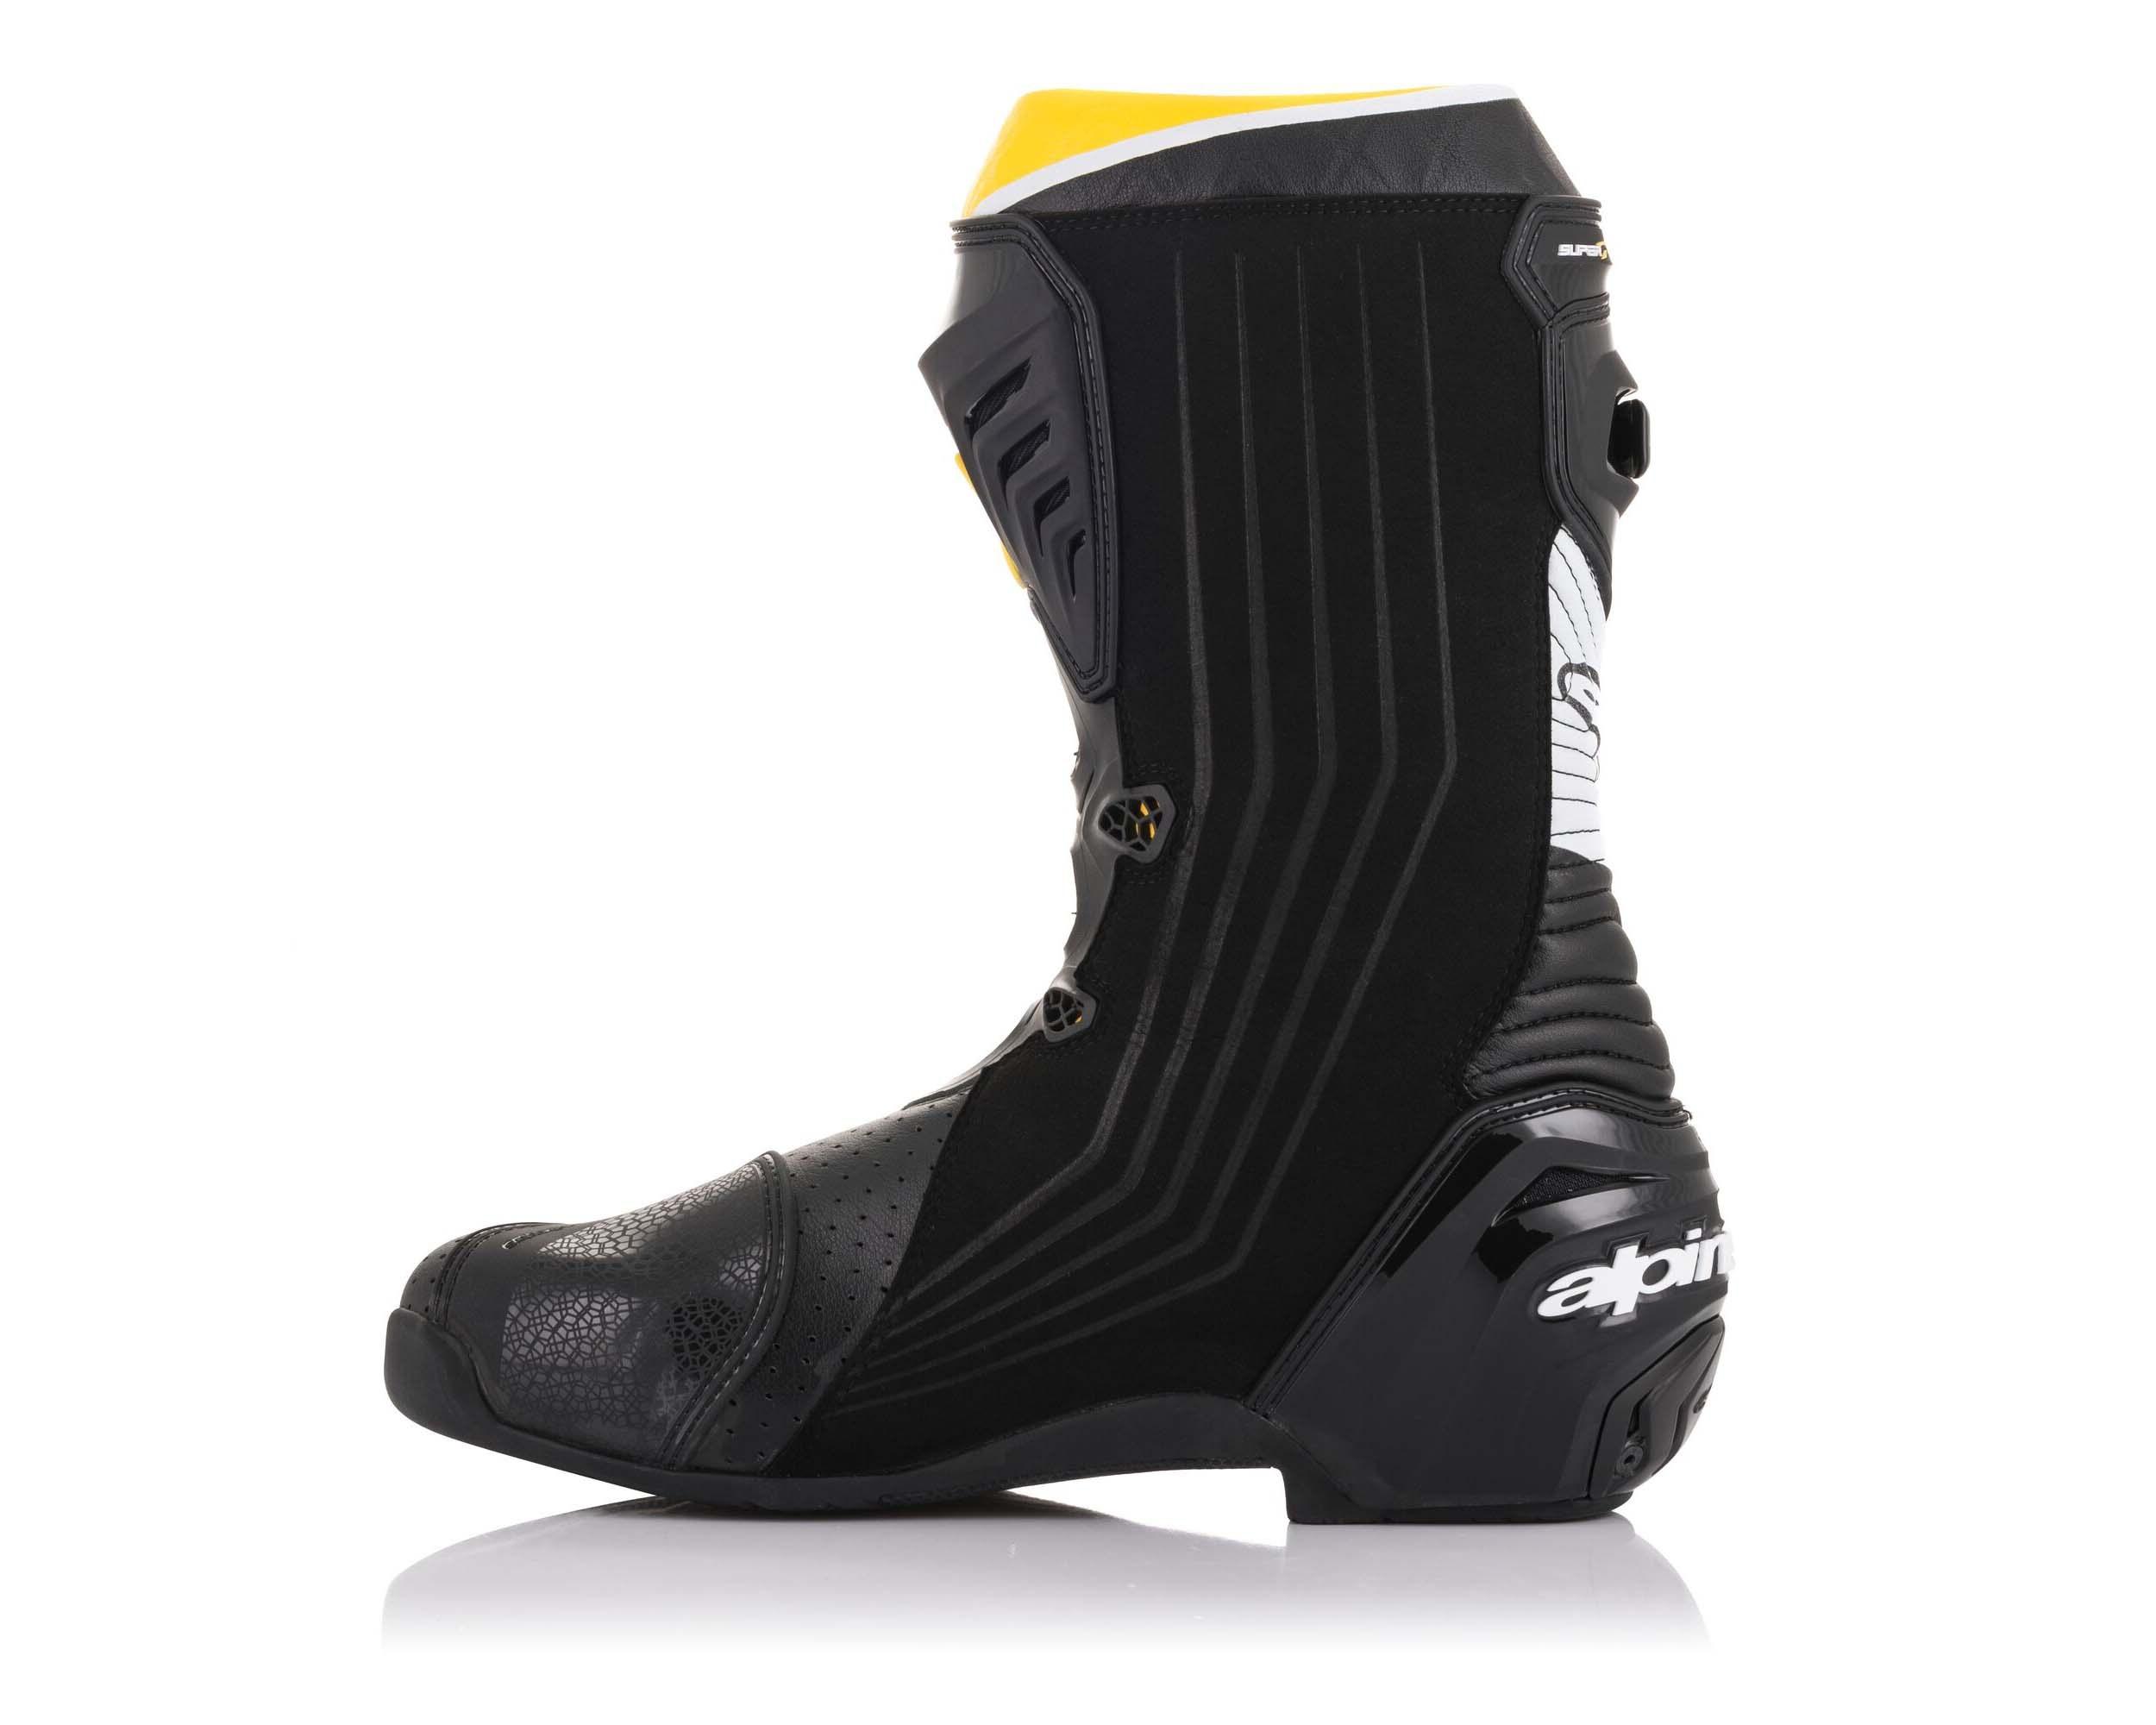 Alpinestars-Supertech-R-Boots-Kenny-Roberts-Sr-03